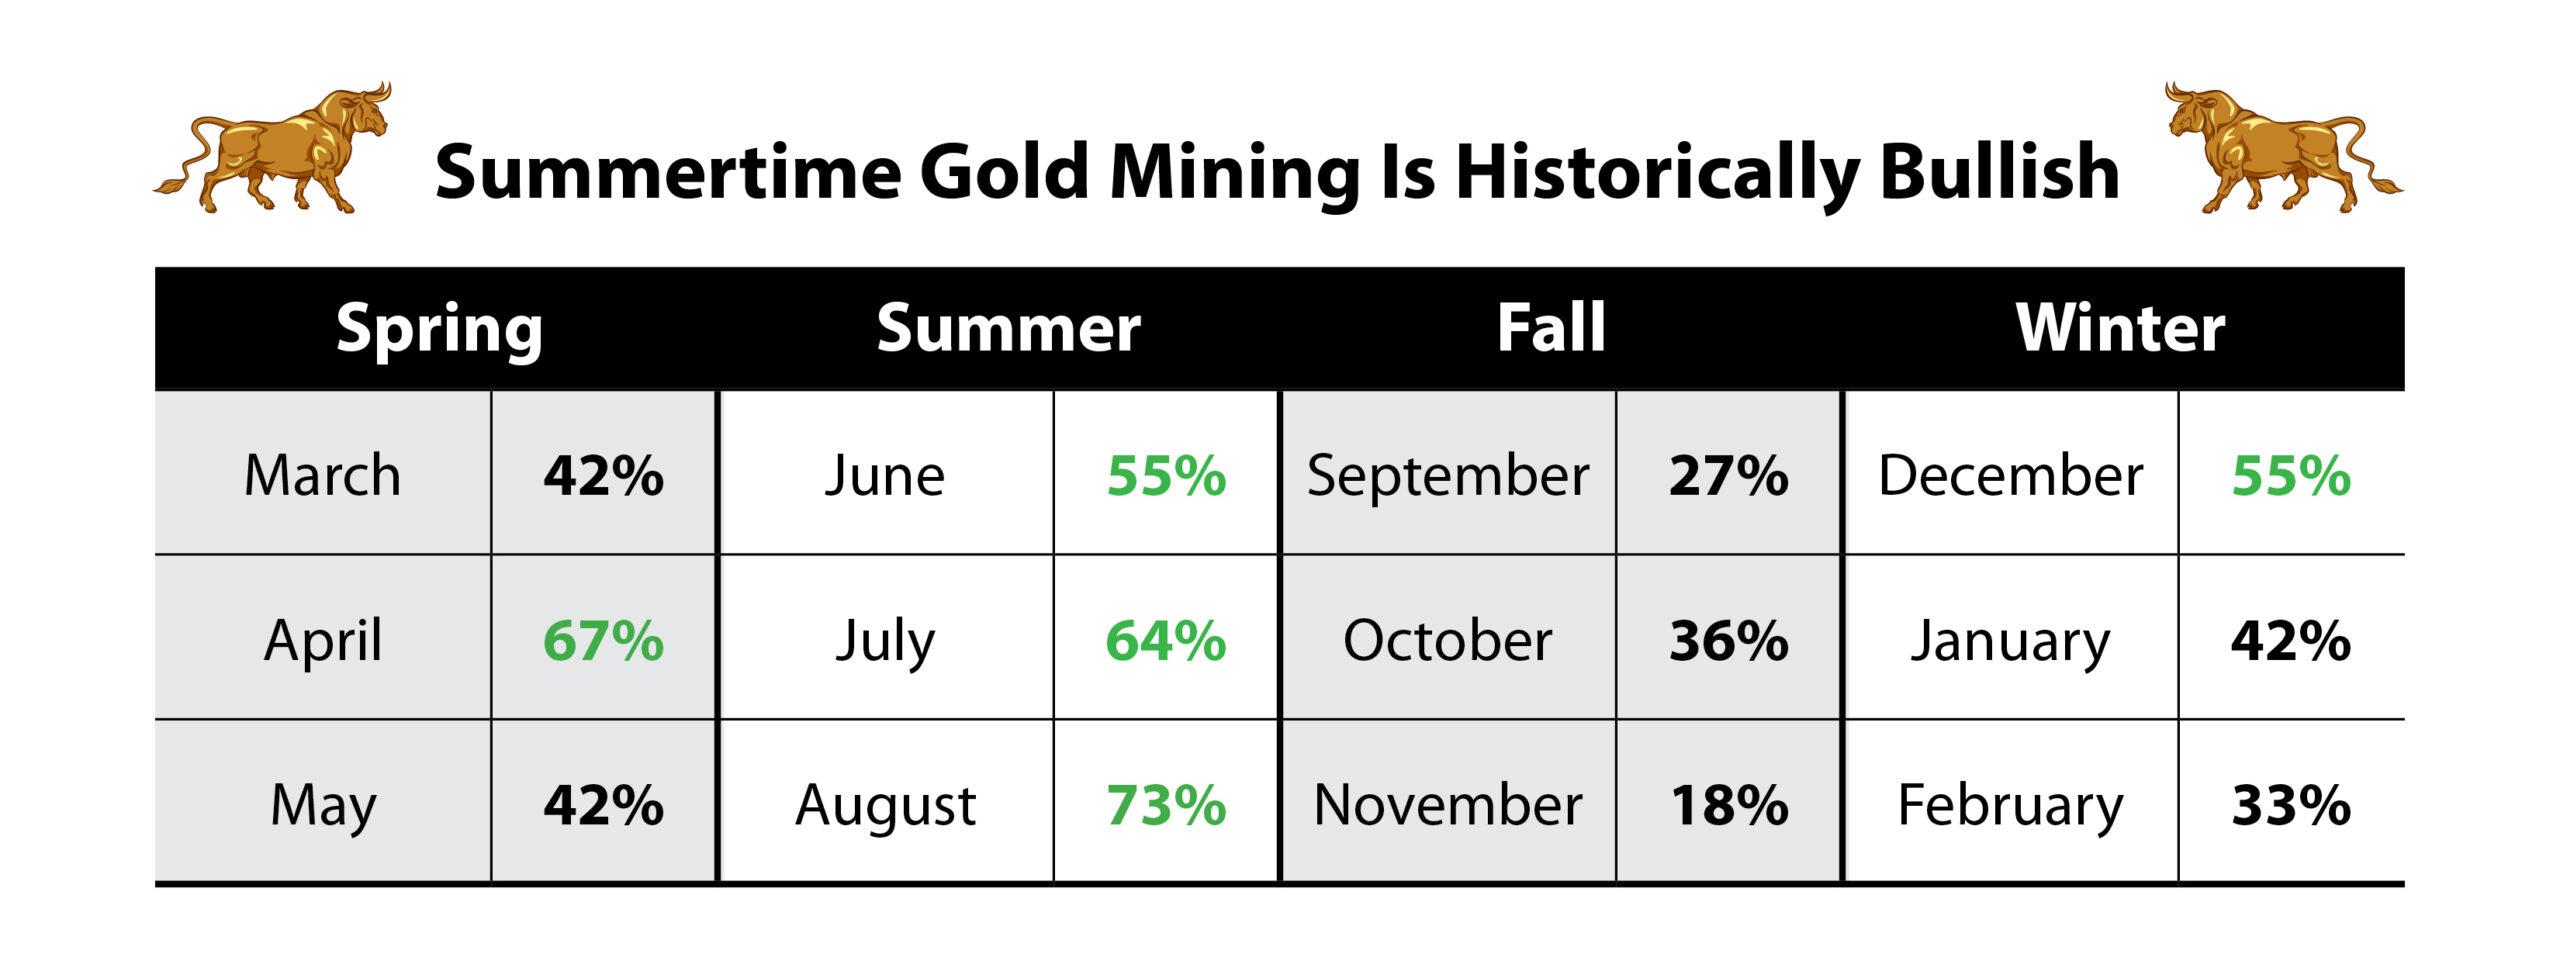 gold miners bullish summertime